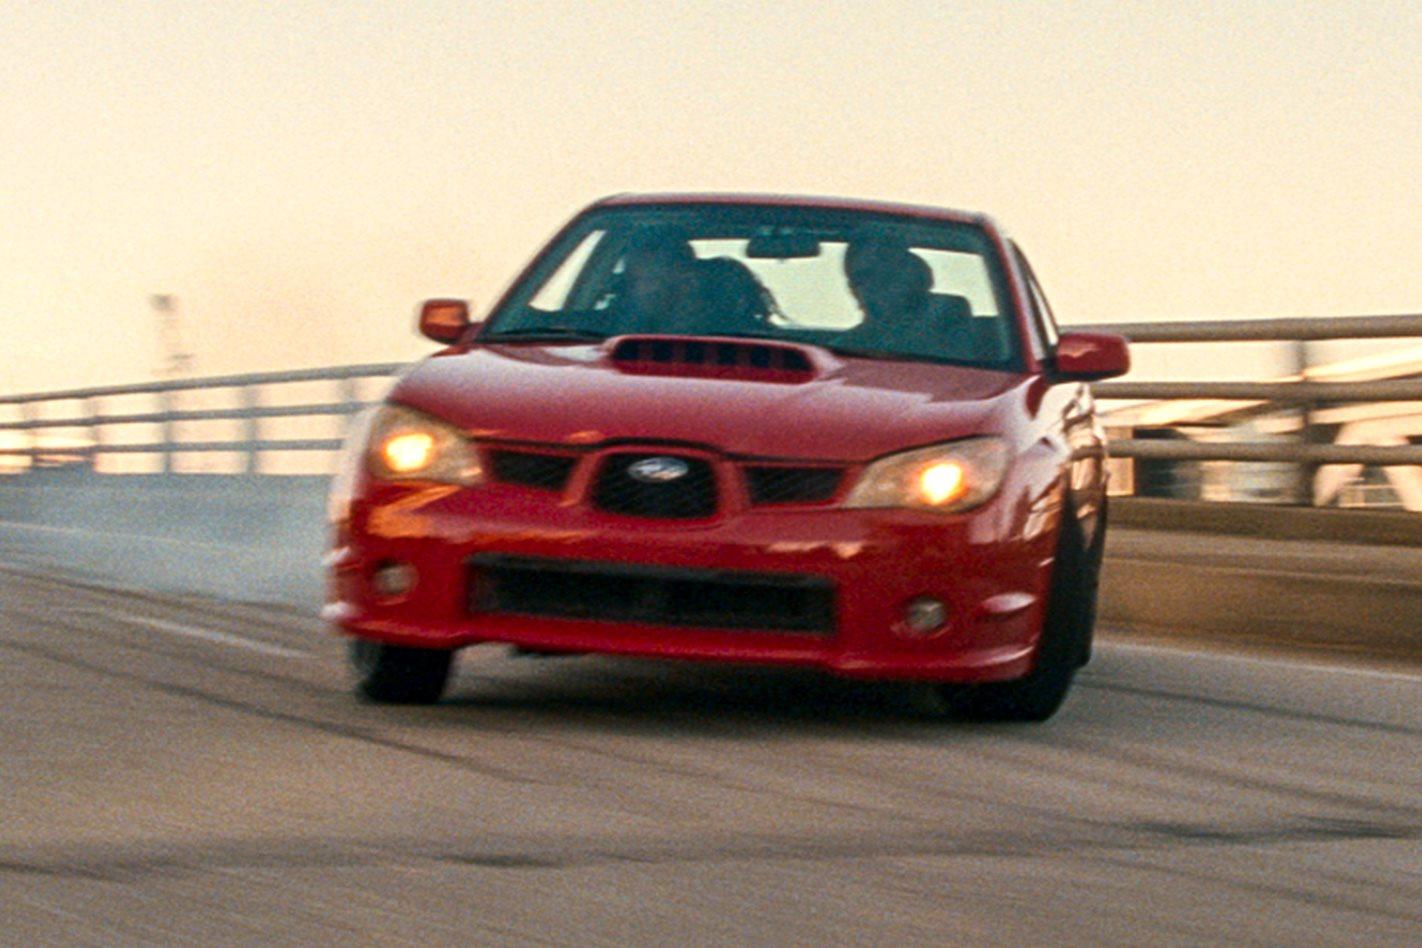 Baby Drivers Subaru WRX skidding